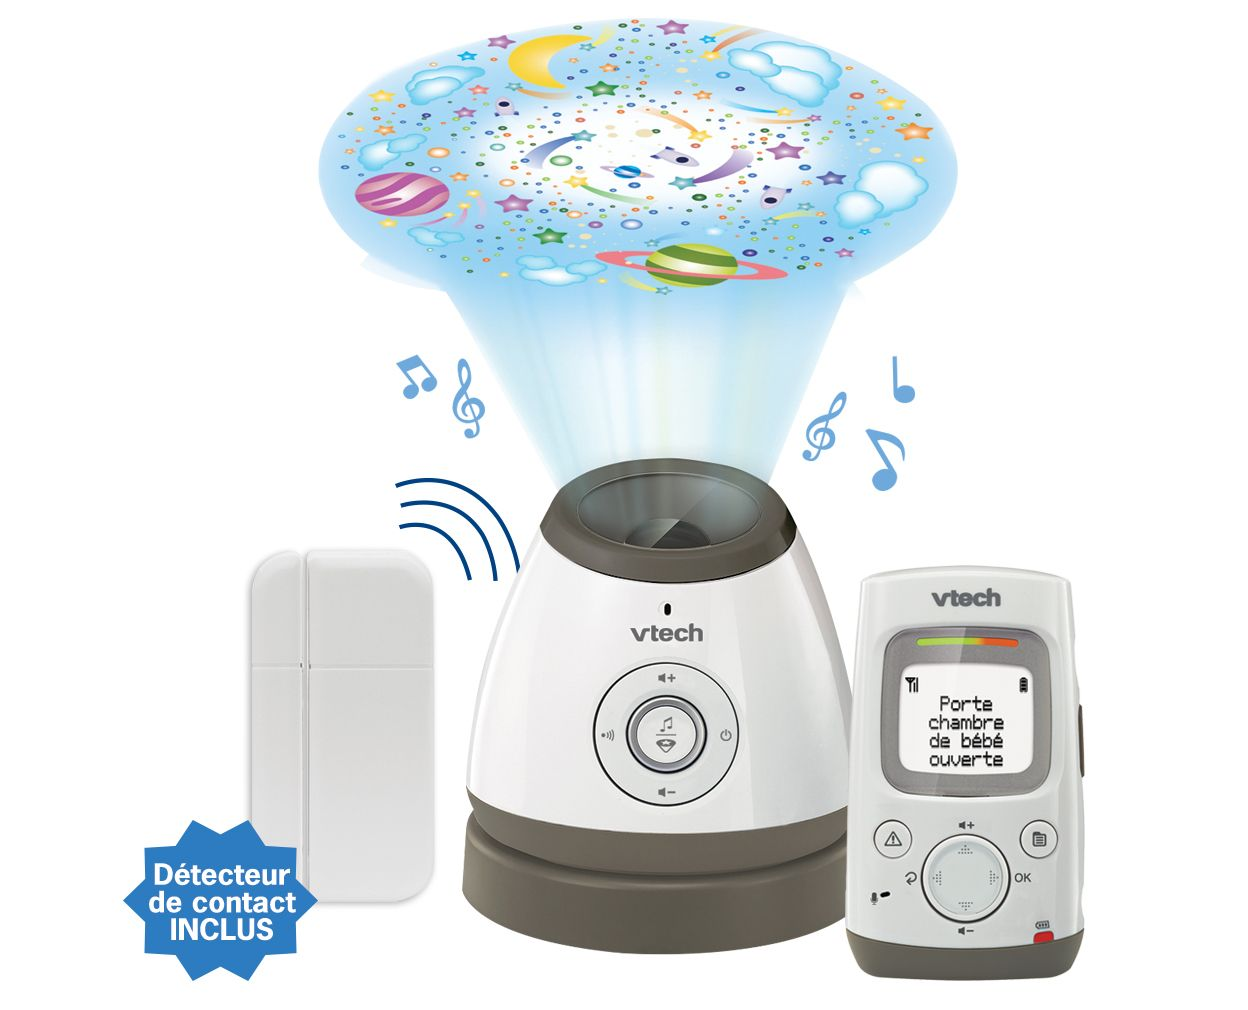 Babyphone Light Show Security BM5000 VTECH